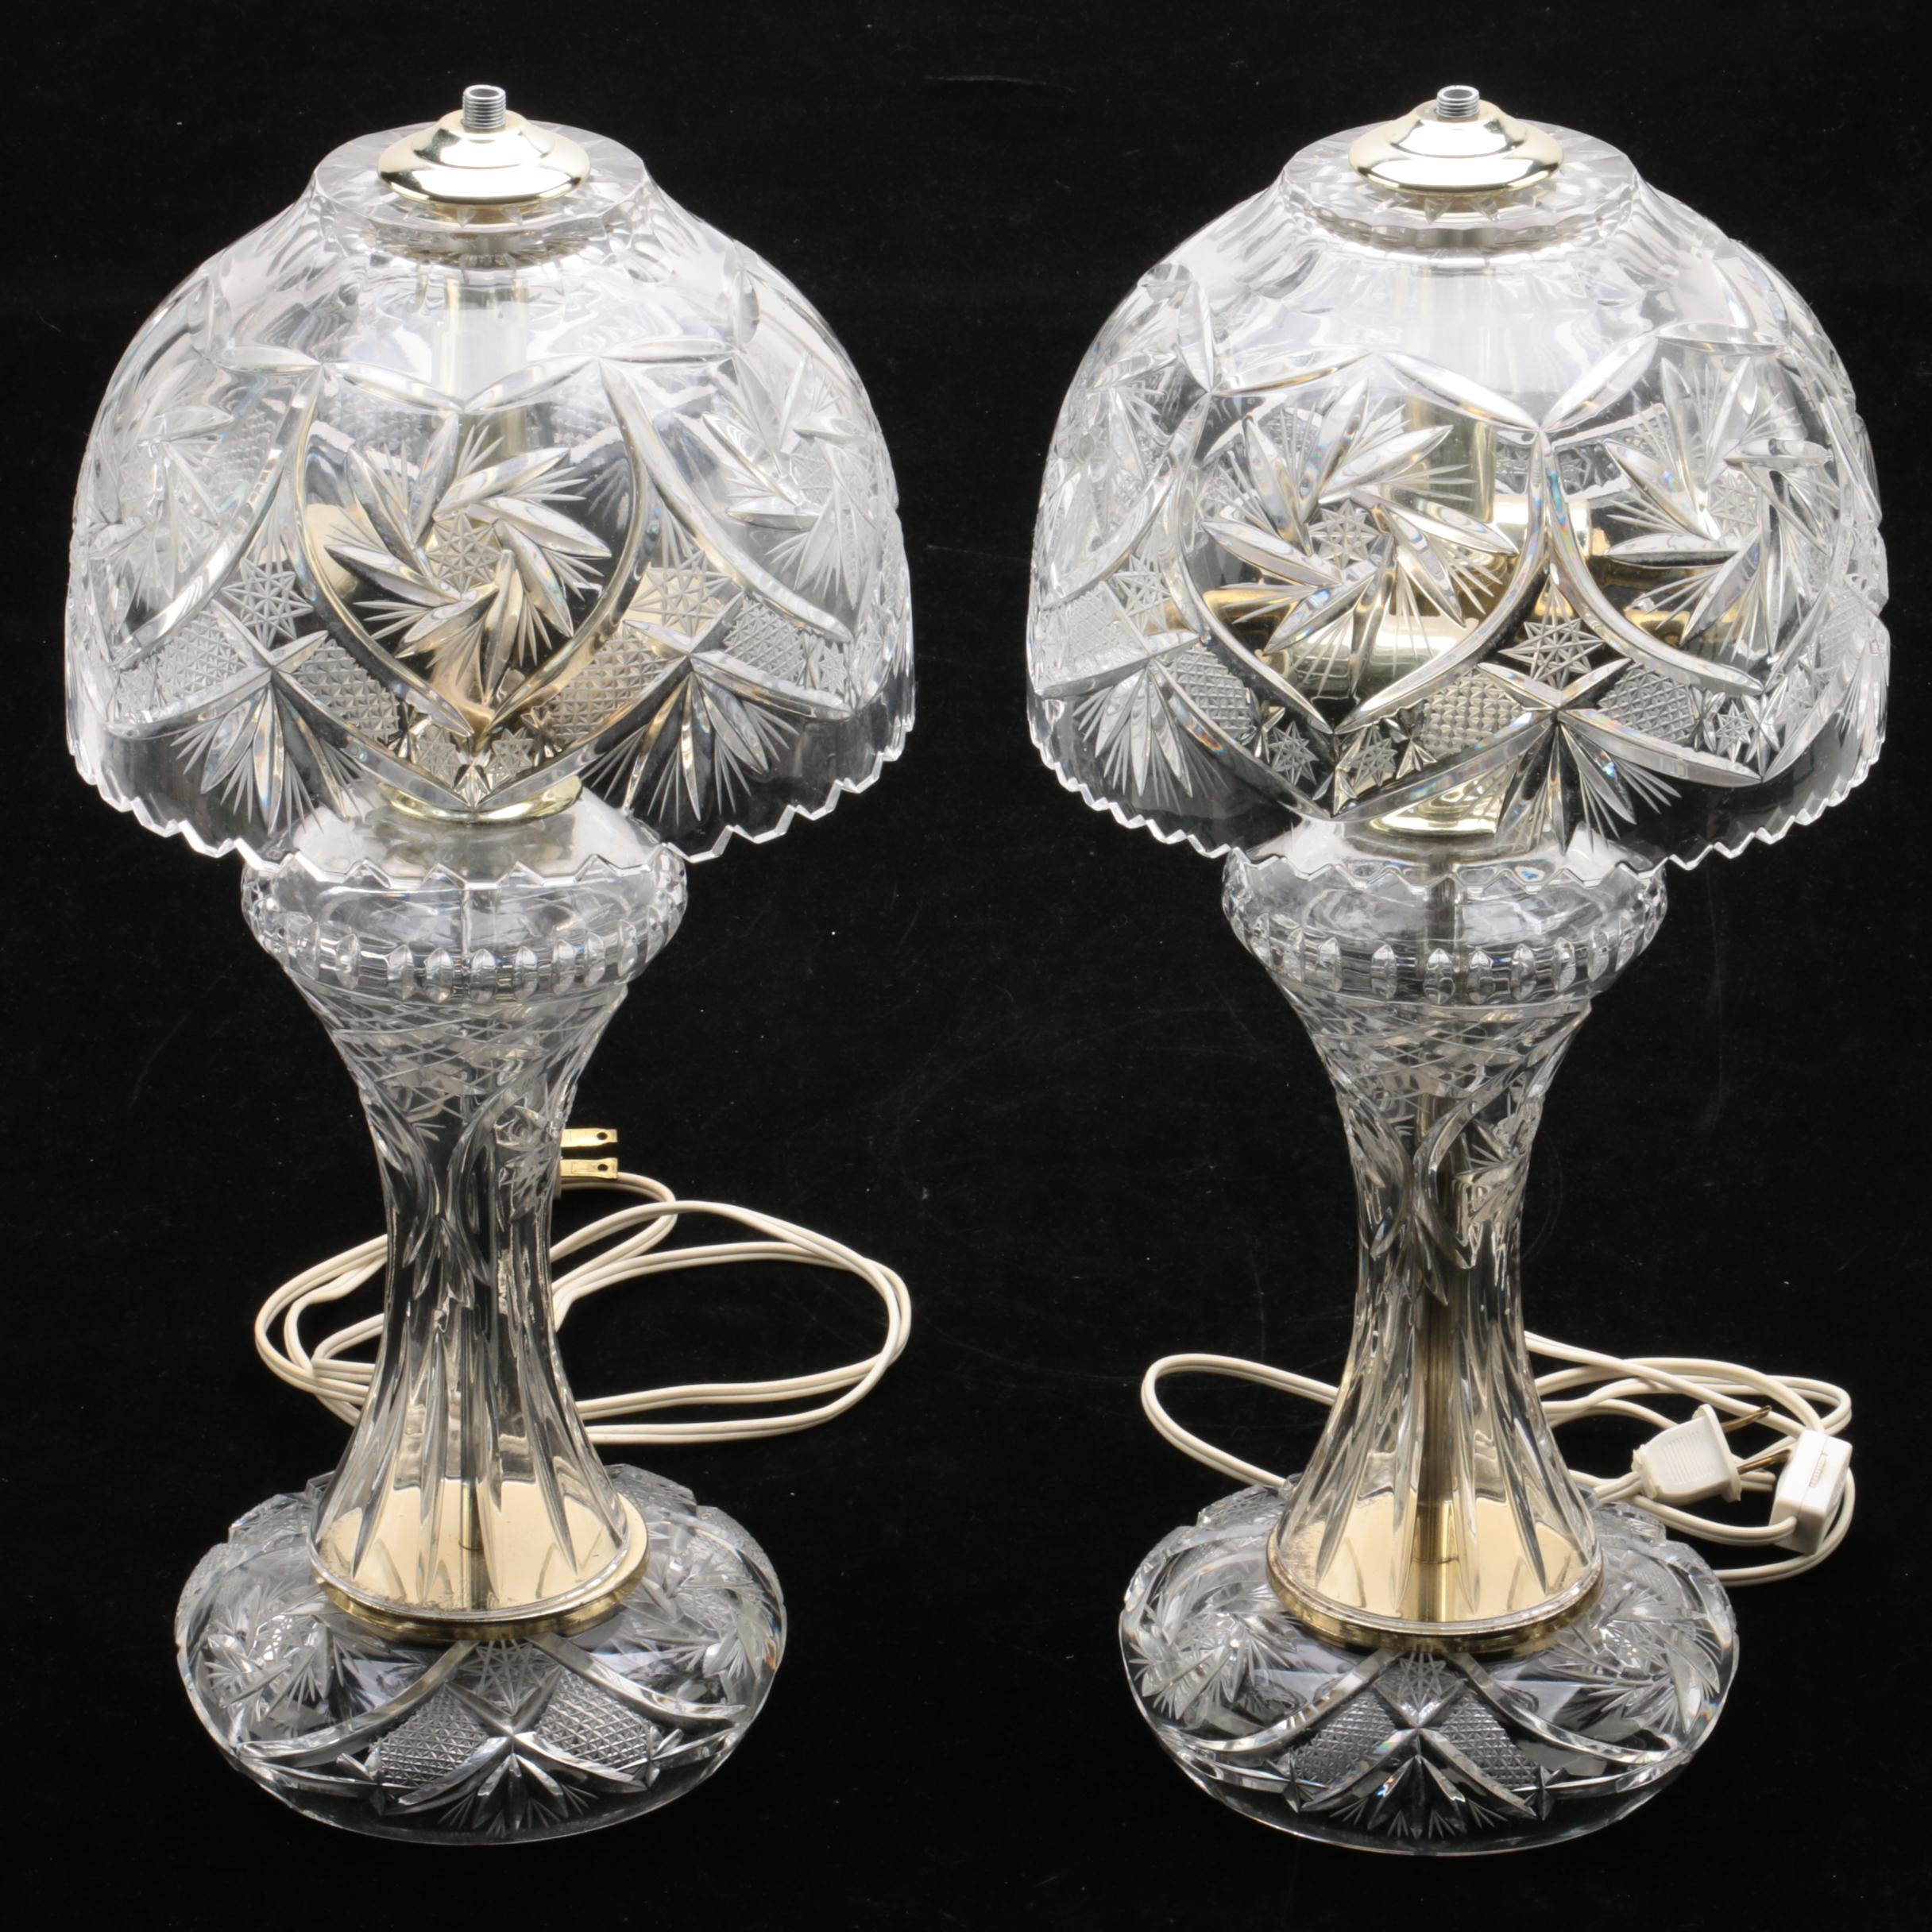 Vintage Cut Crystal Lamps